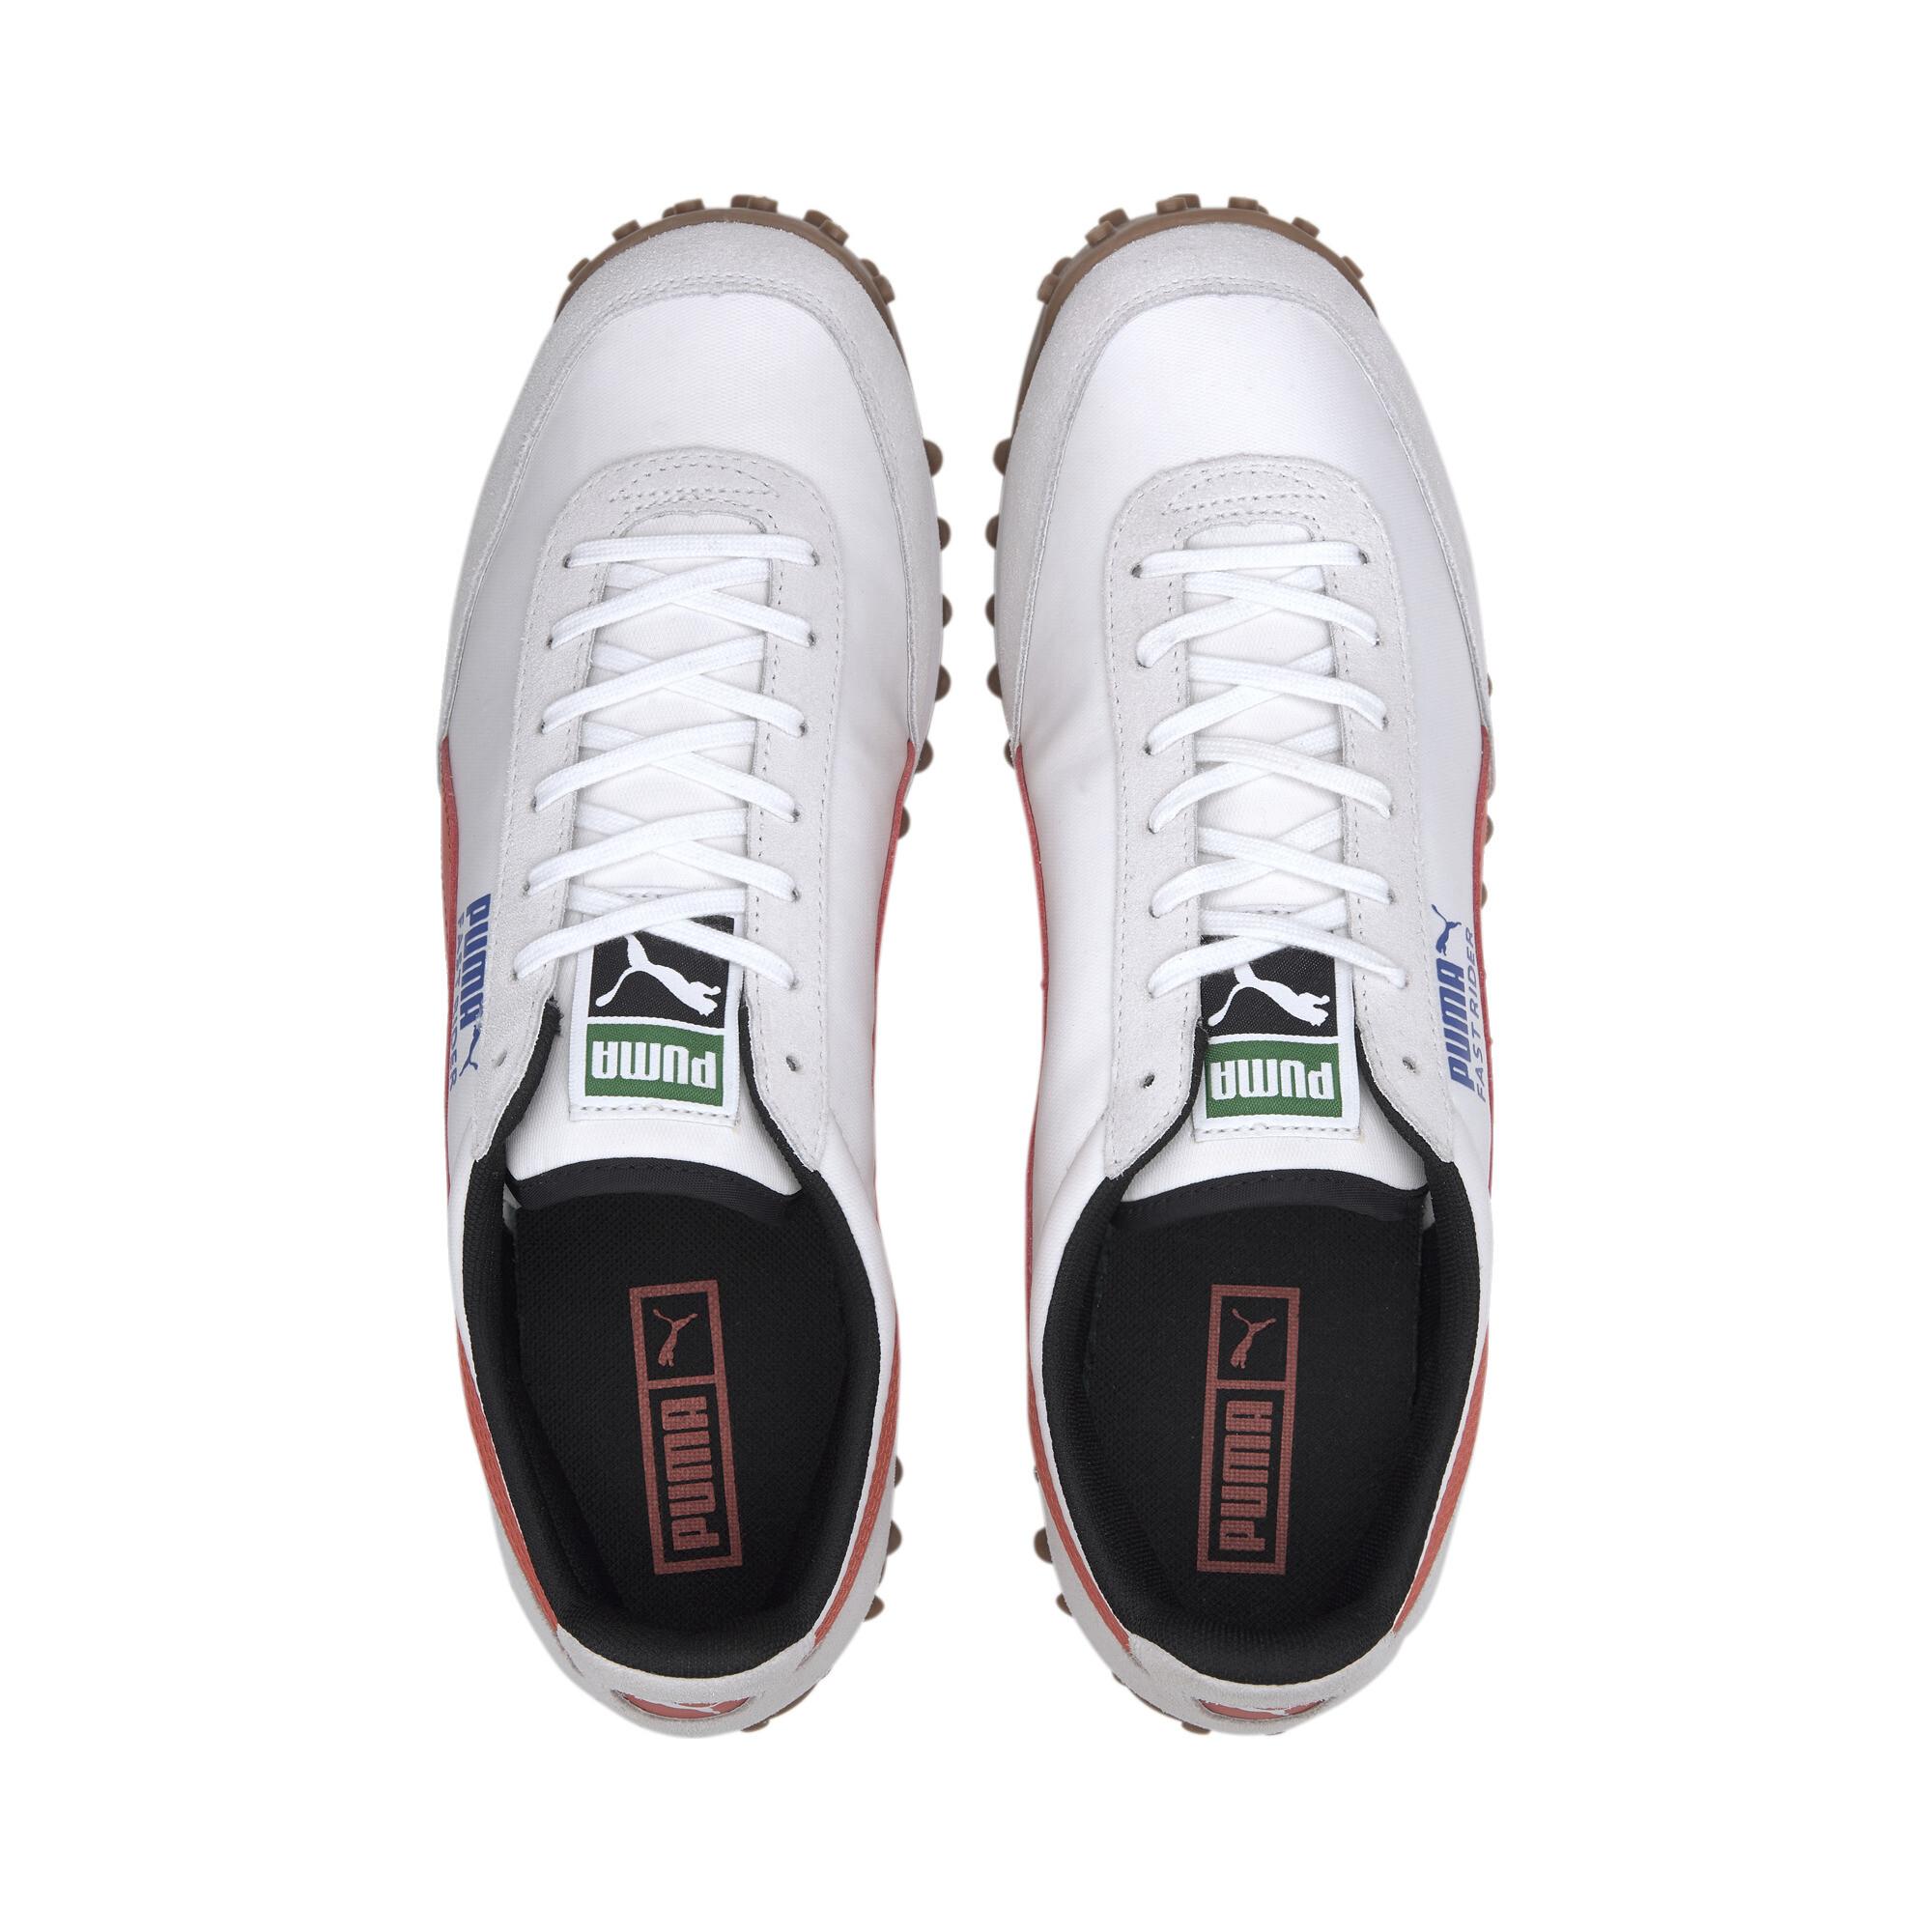 PUMA-Men-039-s-Fast-Rider-Source-Sneakers thumbnail 15